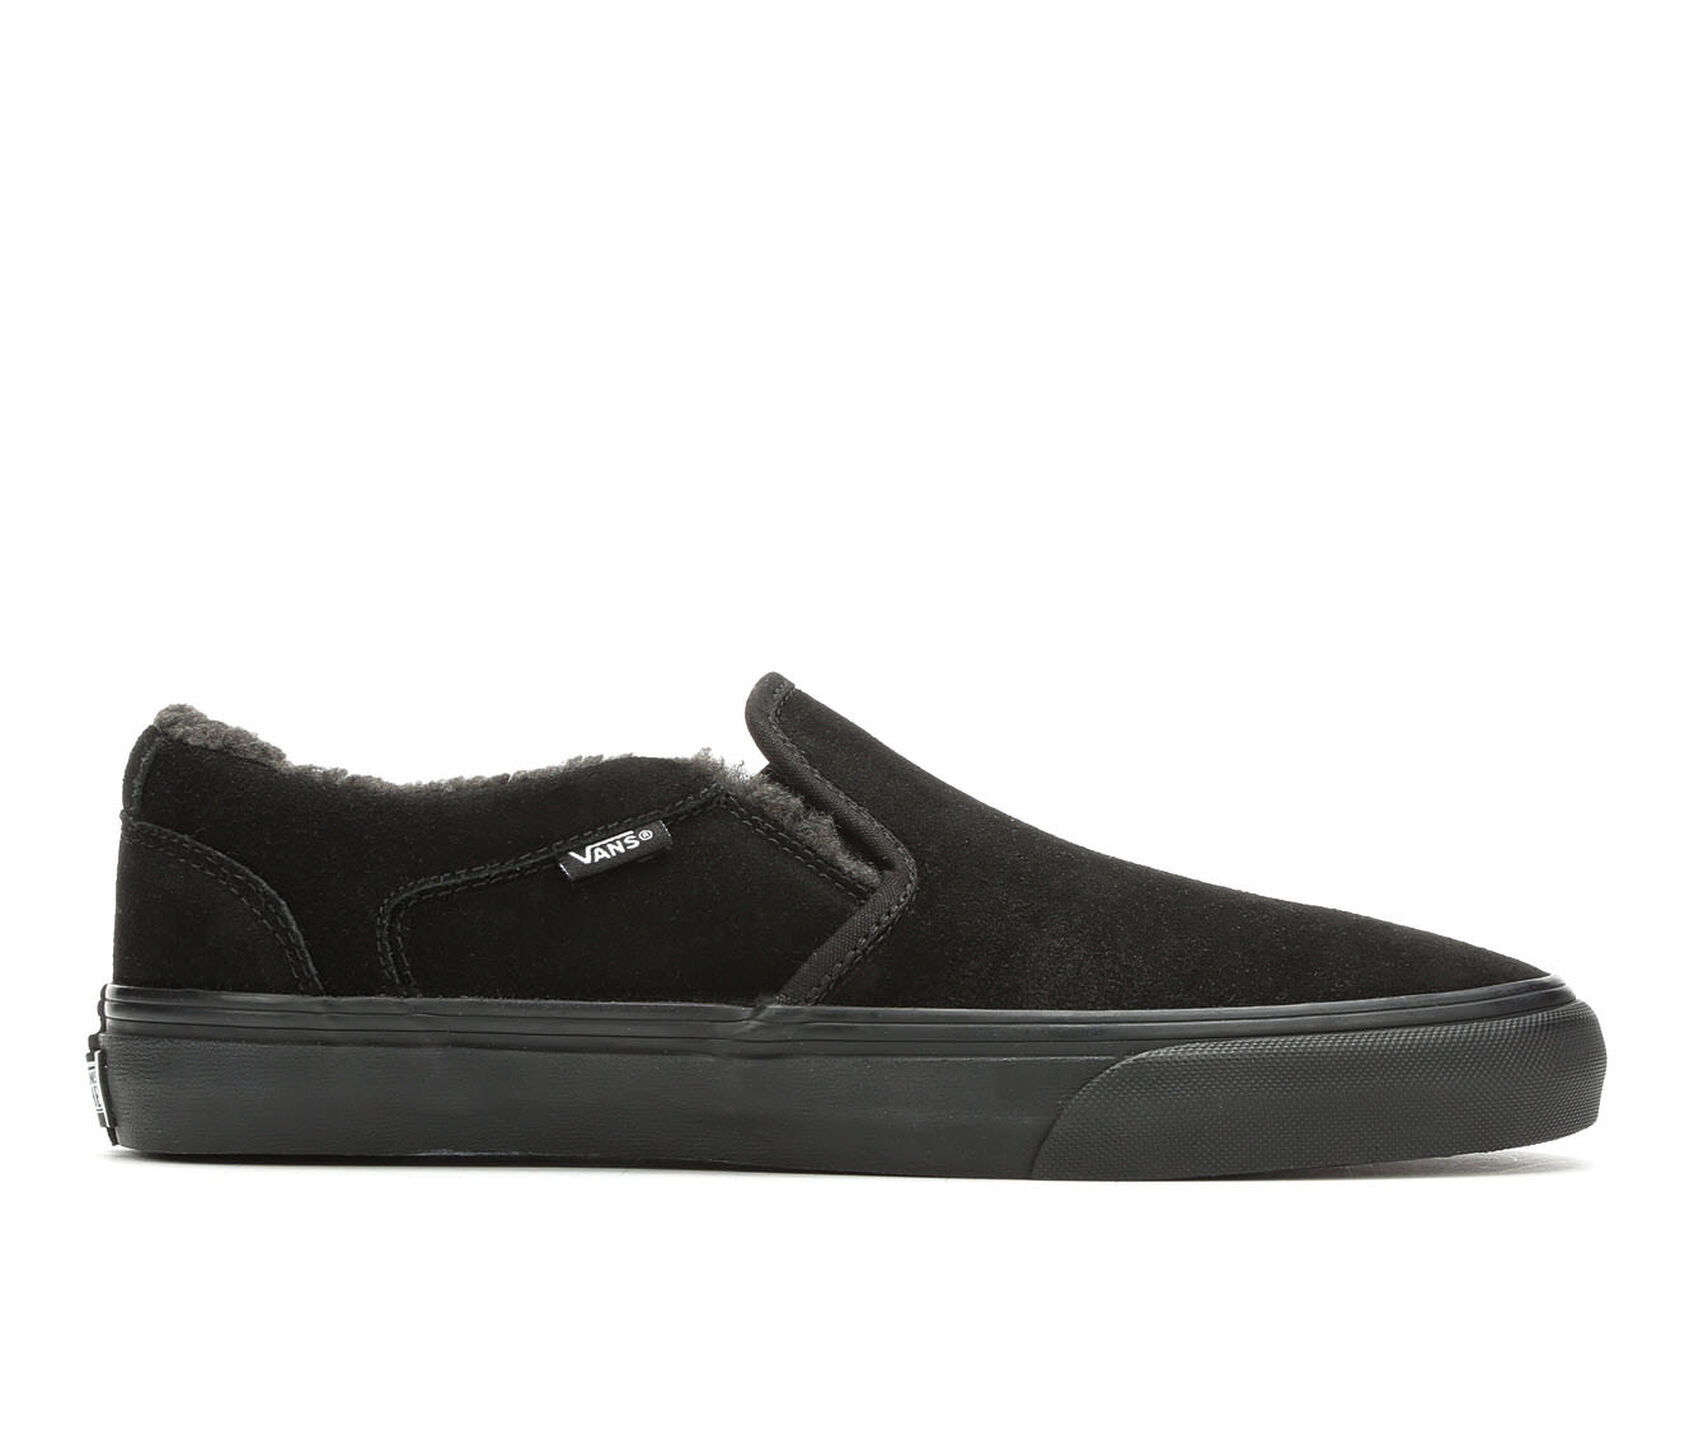 a5a3cbdb065 ... Vans Asher-Deluxe Skate Shoes. Previous